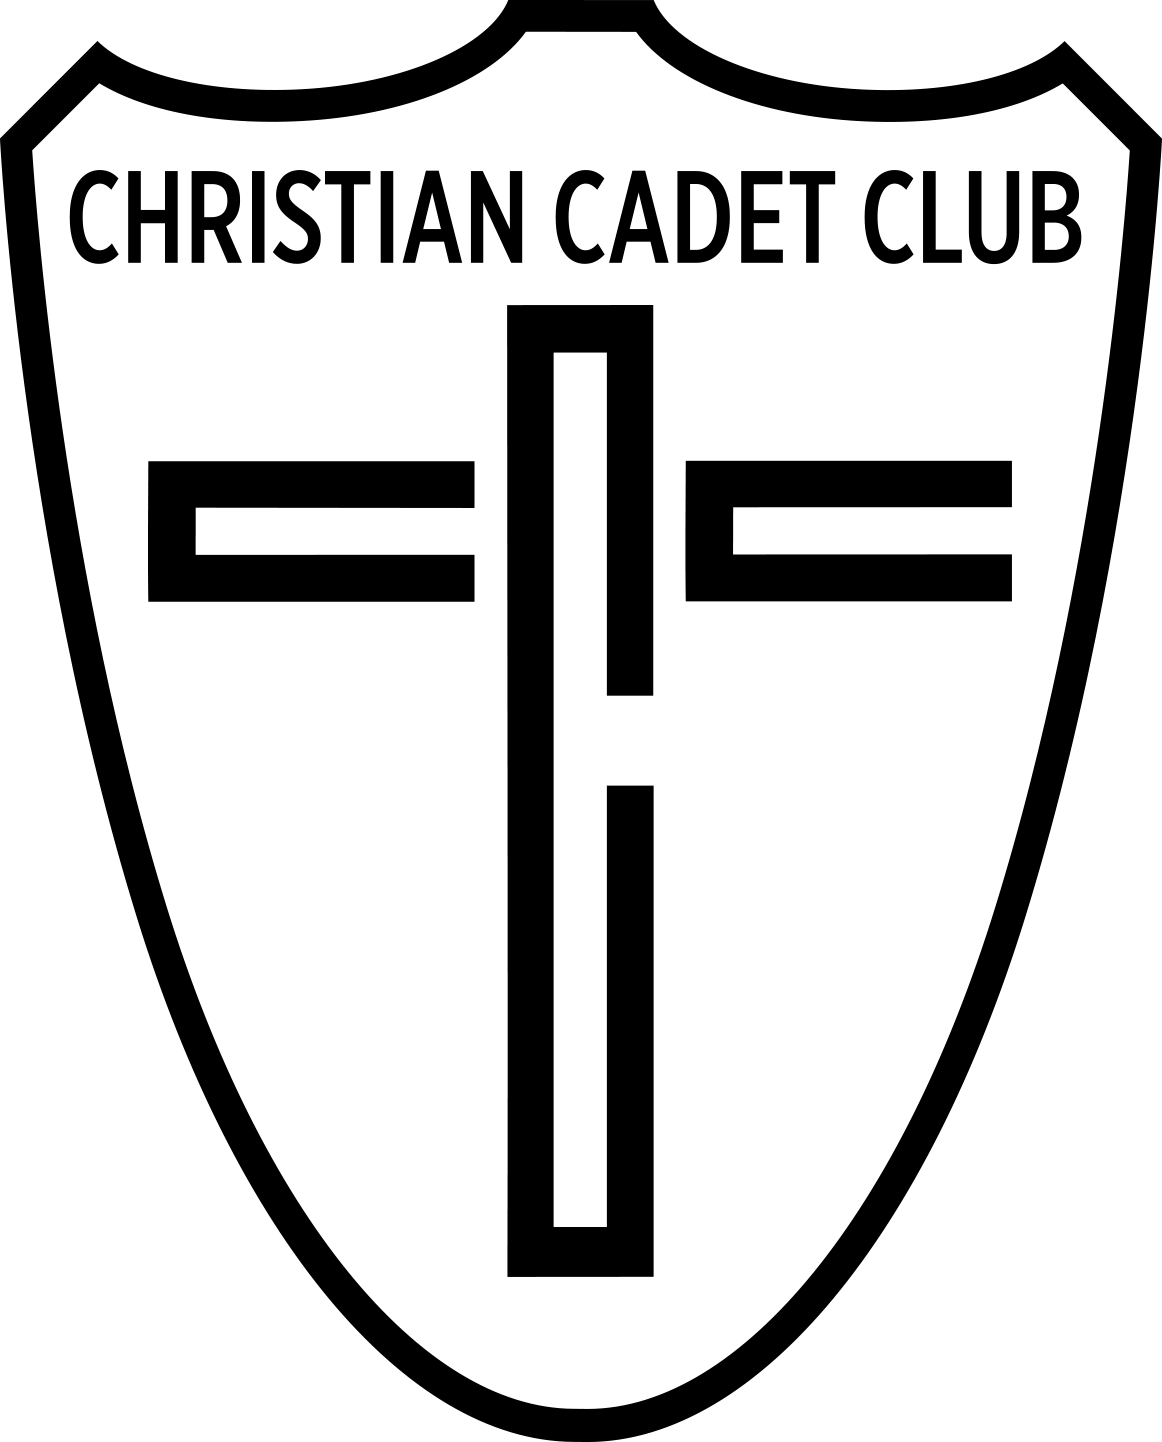 EmblemChristianCadetClubBandW.png